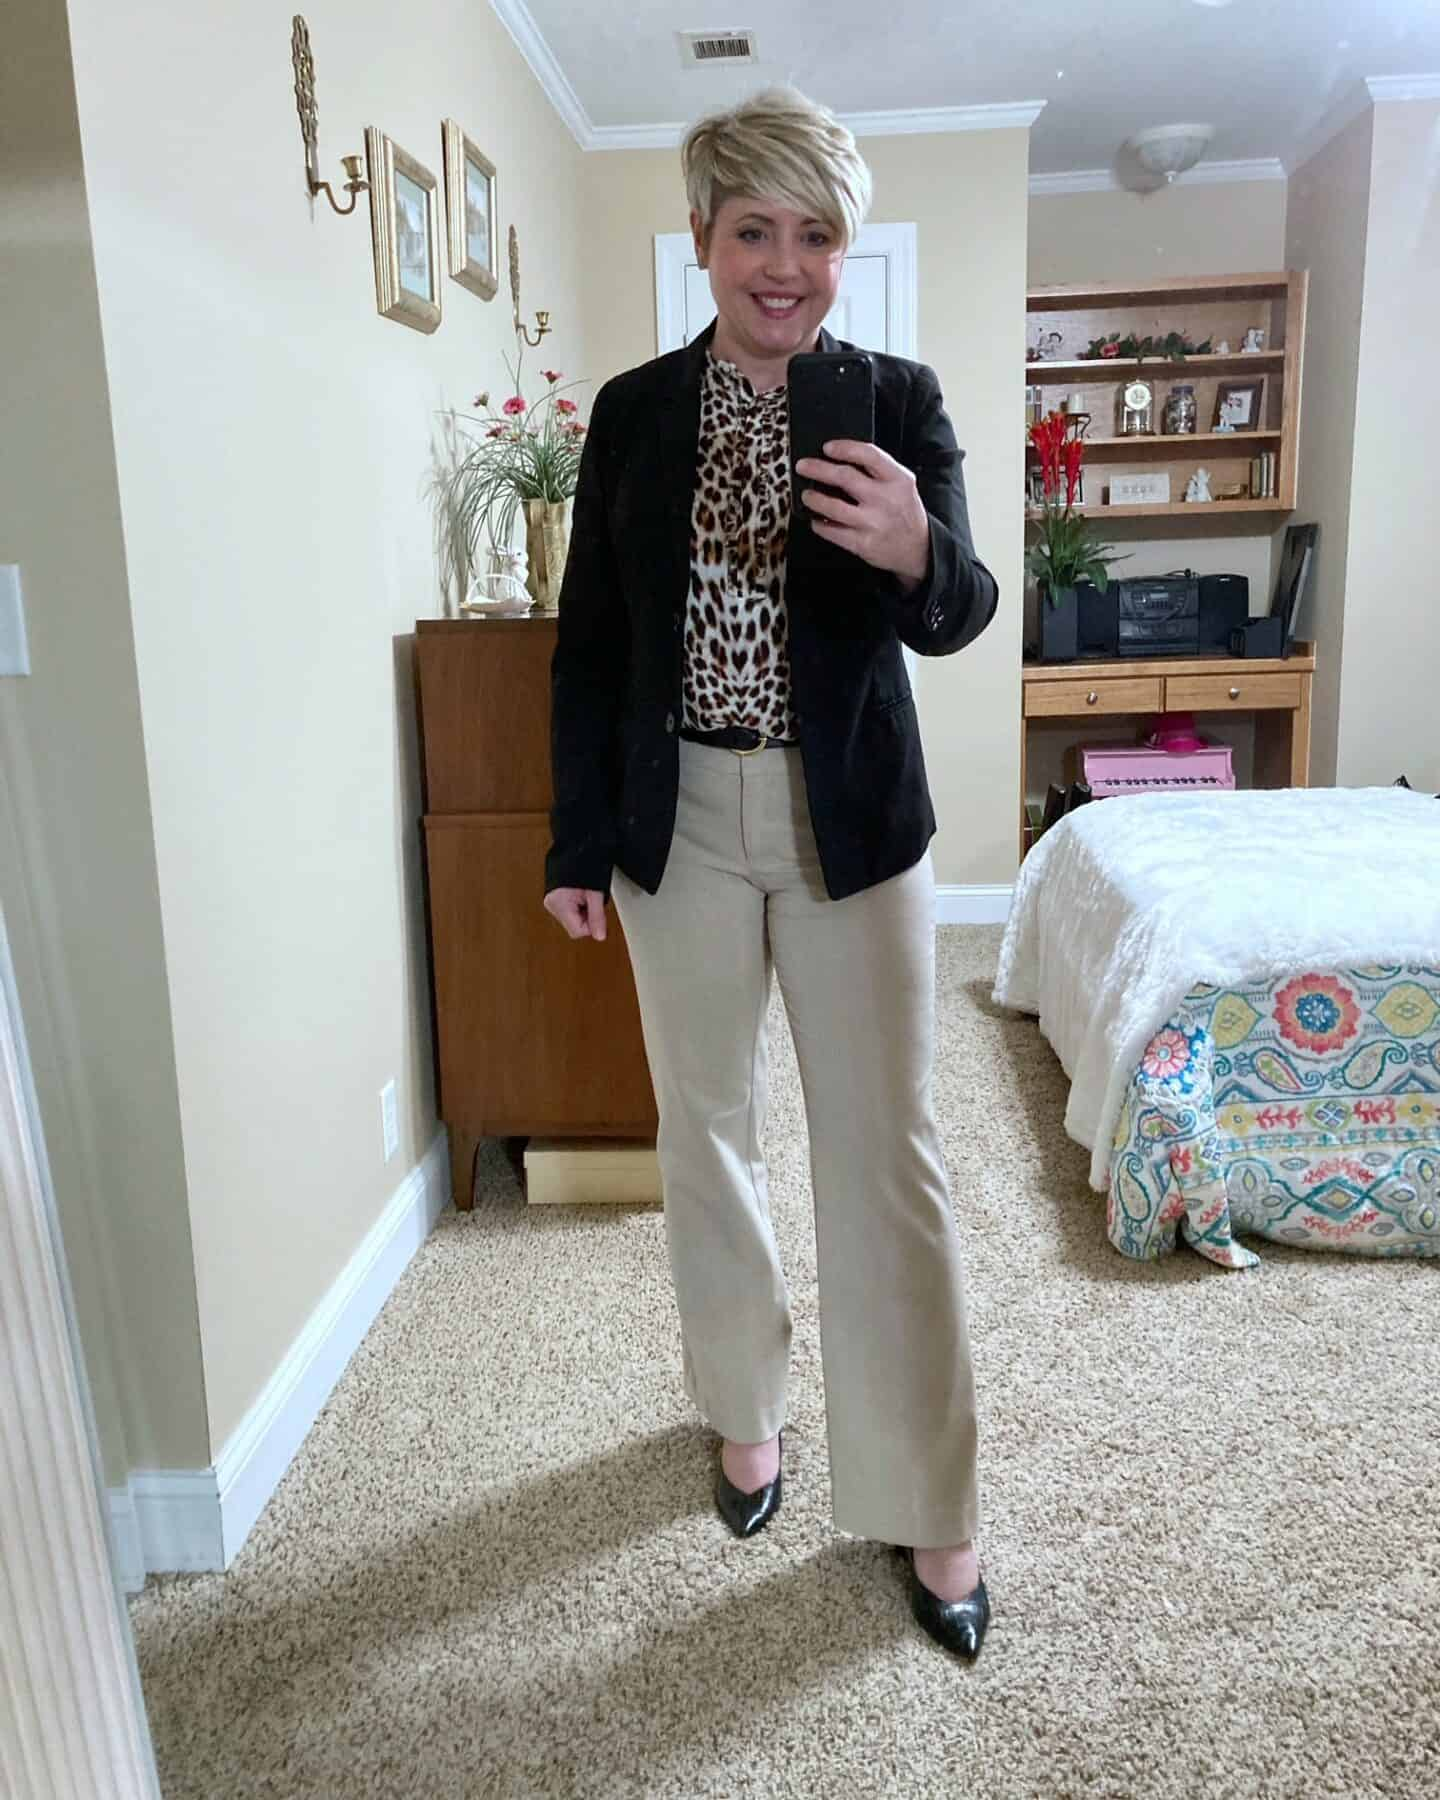 neutral work wear with leopard top